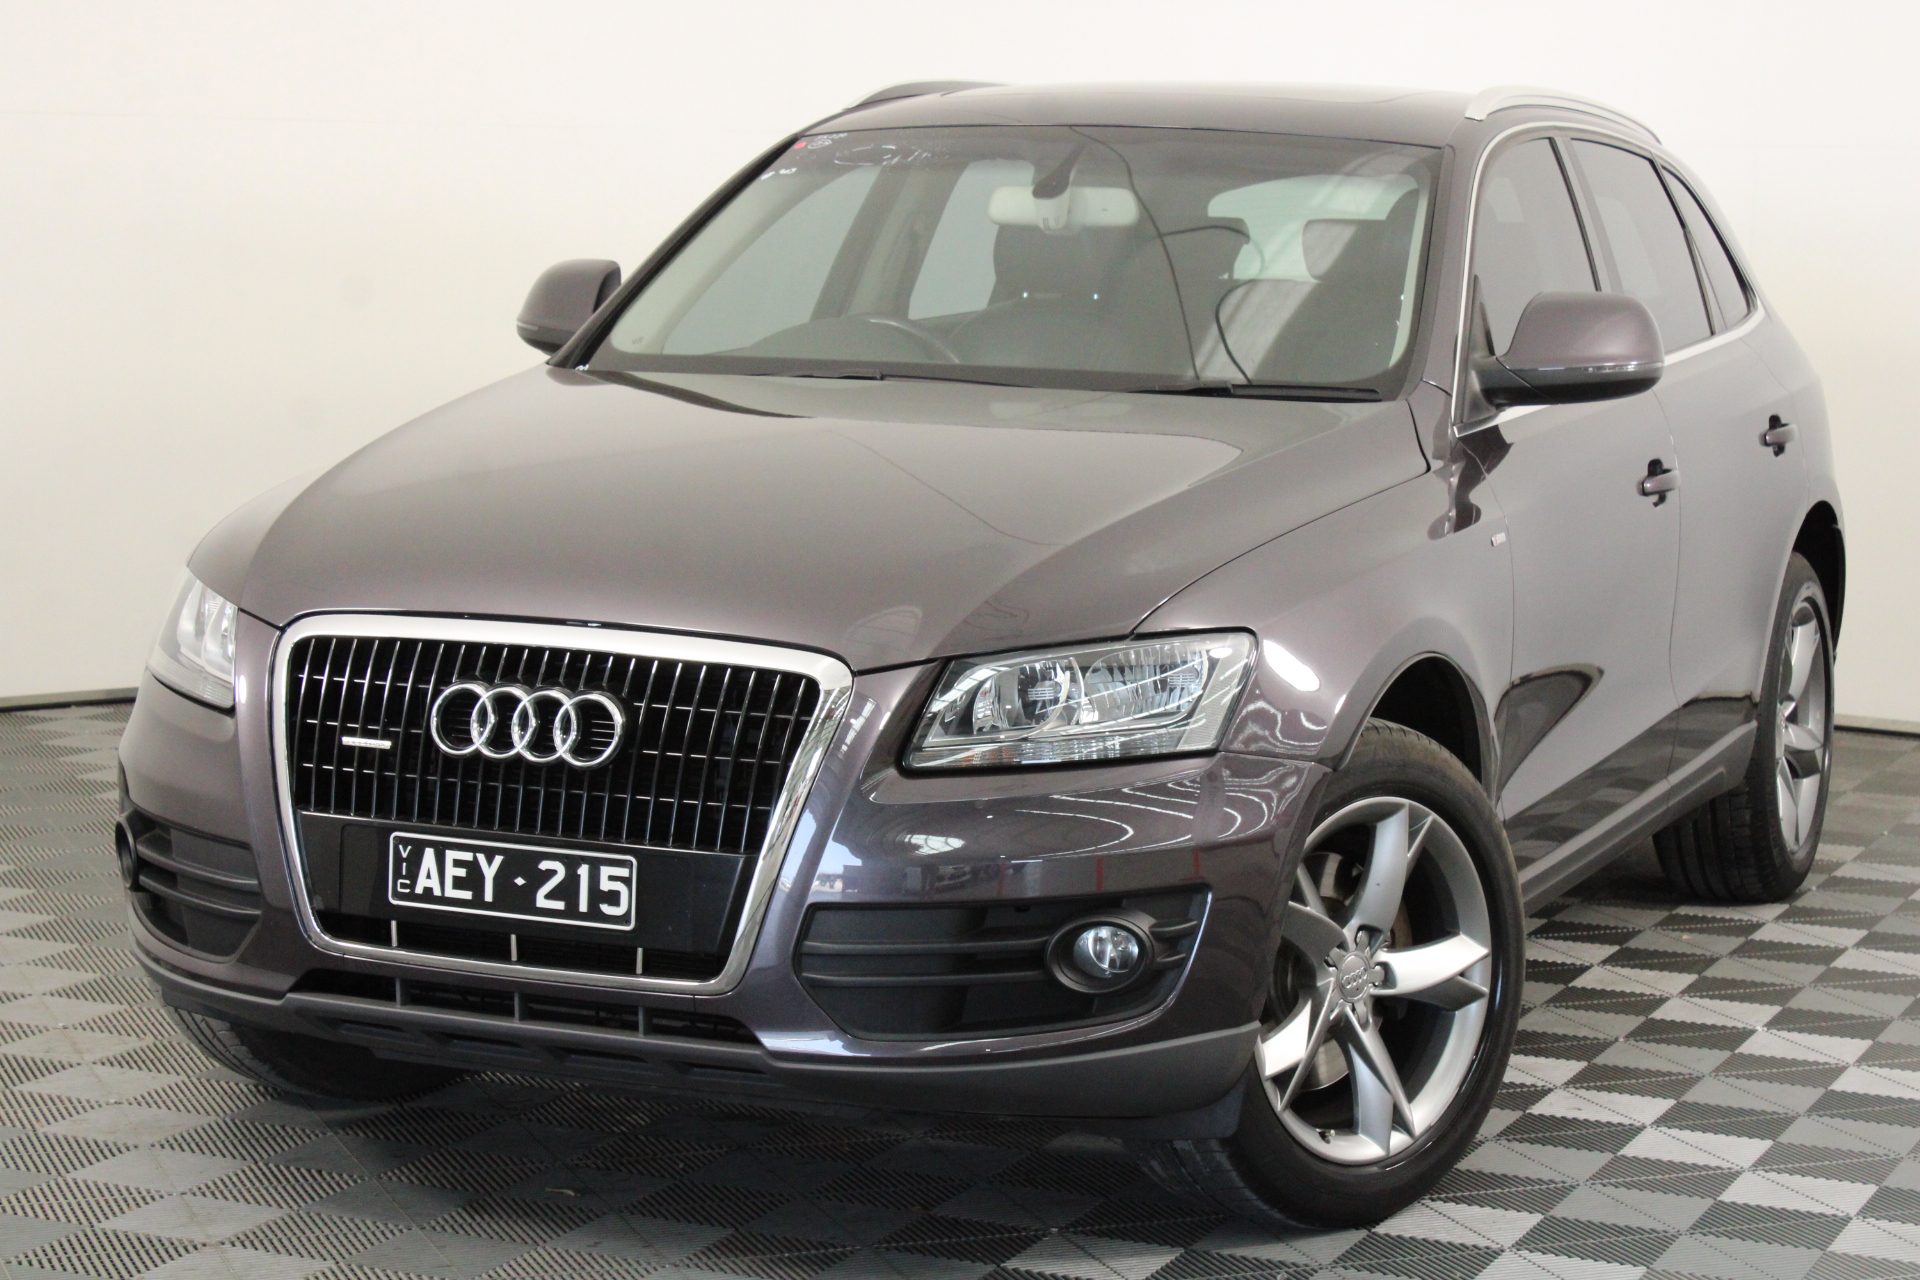 2009 Audi Q5 3.2 FSI Quattro 8R Automatic Wagon